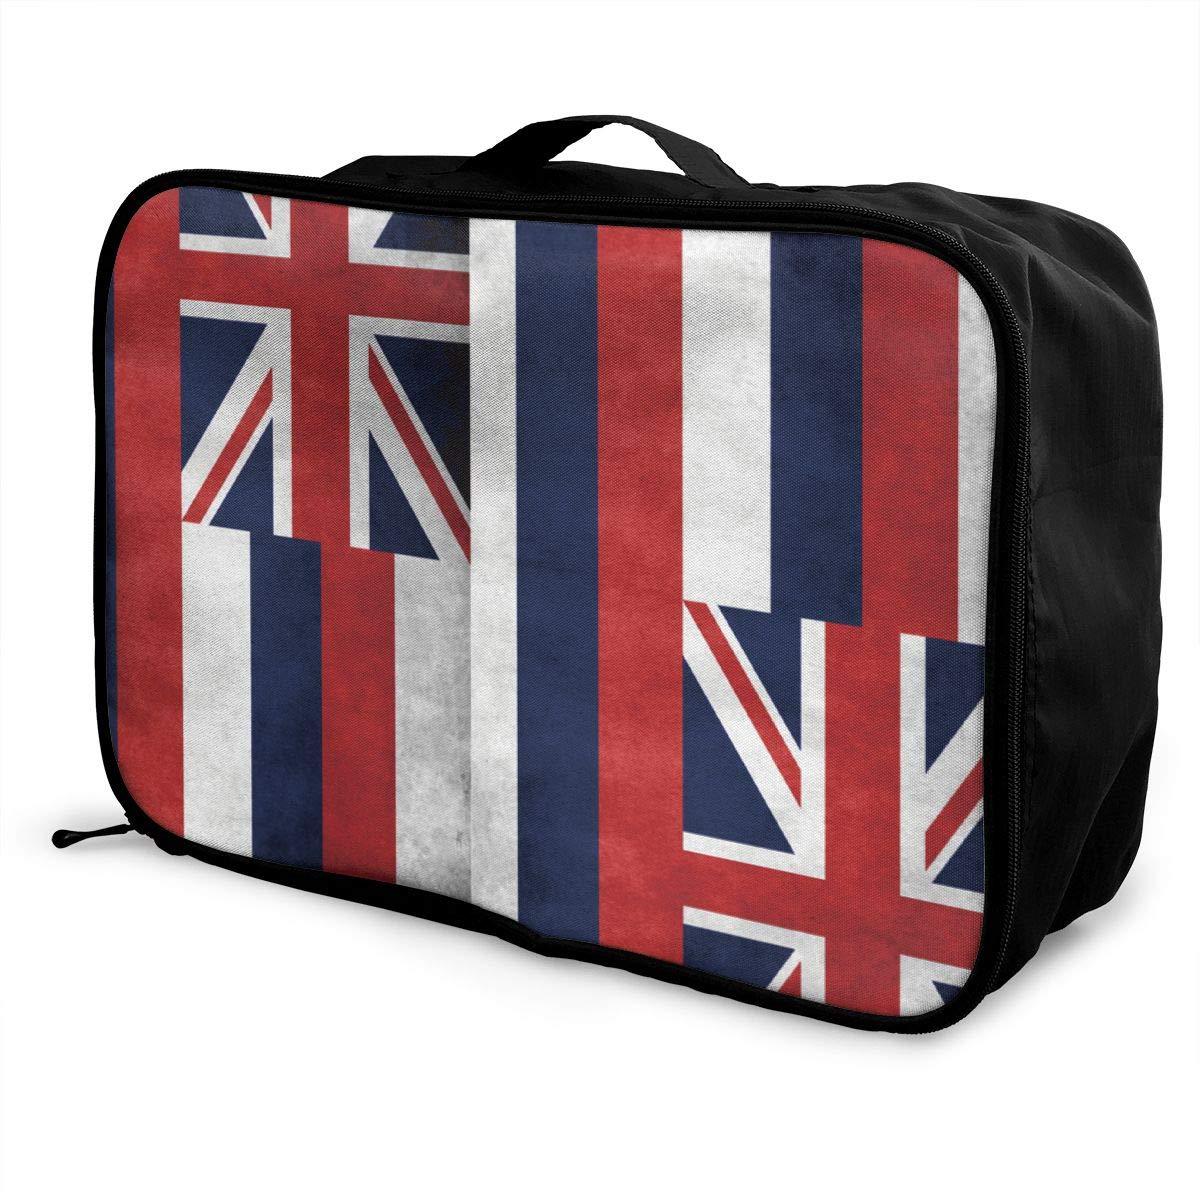 YueLJB Grunge Hawaii Flag Lightweight Large Capacity Portable Luggage Bag Travel Duffel Bag Storage Carry Luggage Duffle Tote Bag